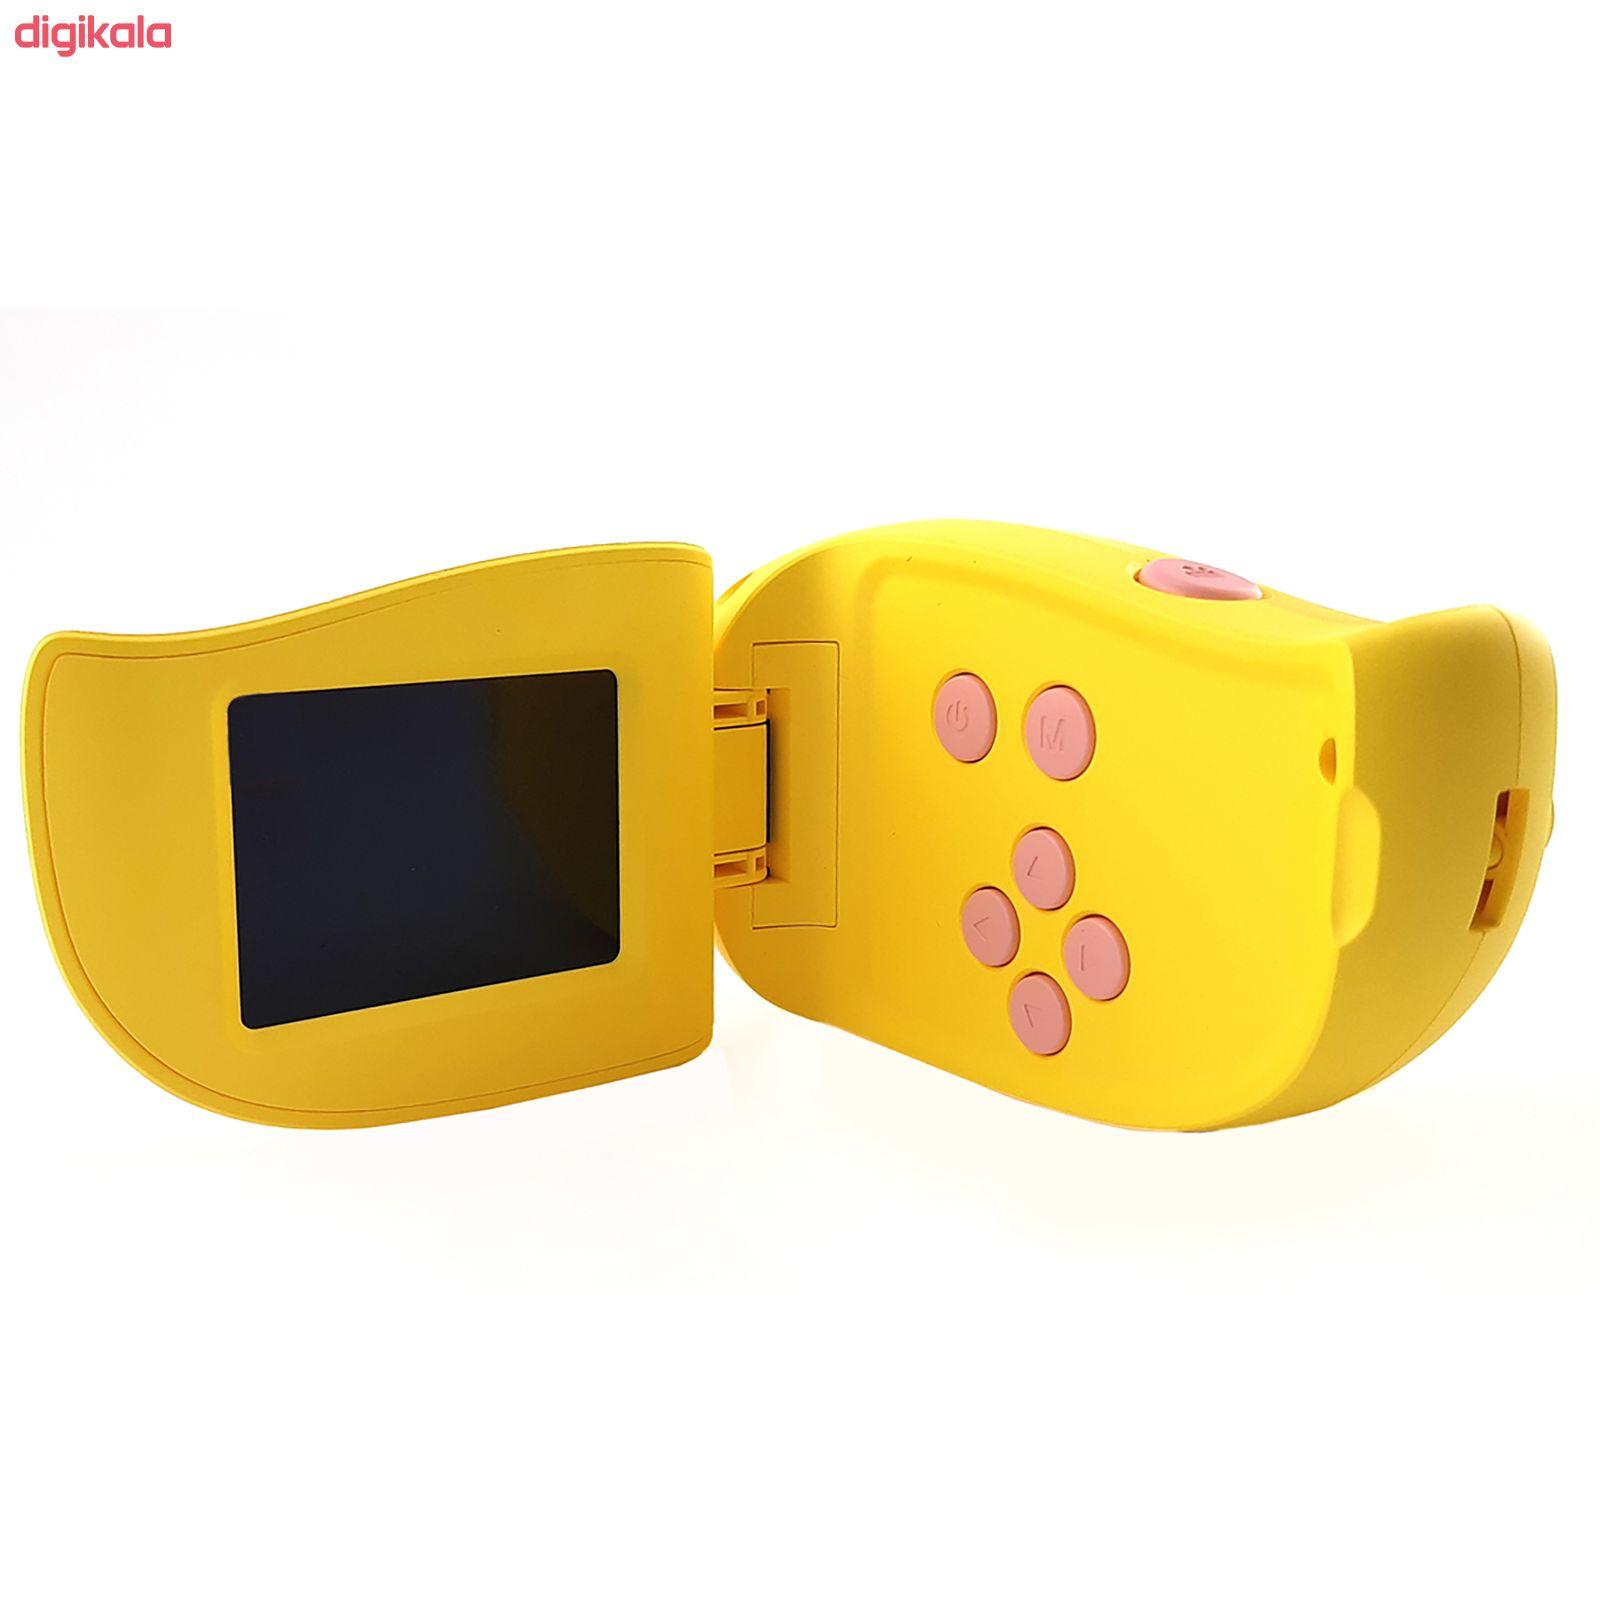 دوربین دیجیتال آکسون مدل AX6066 main 1 3